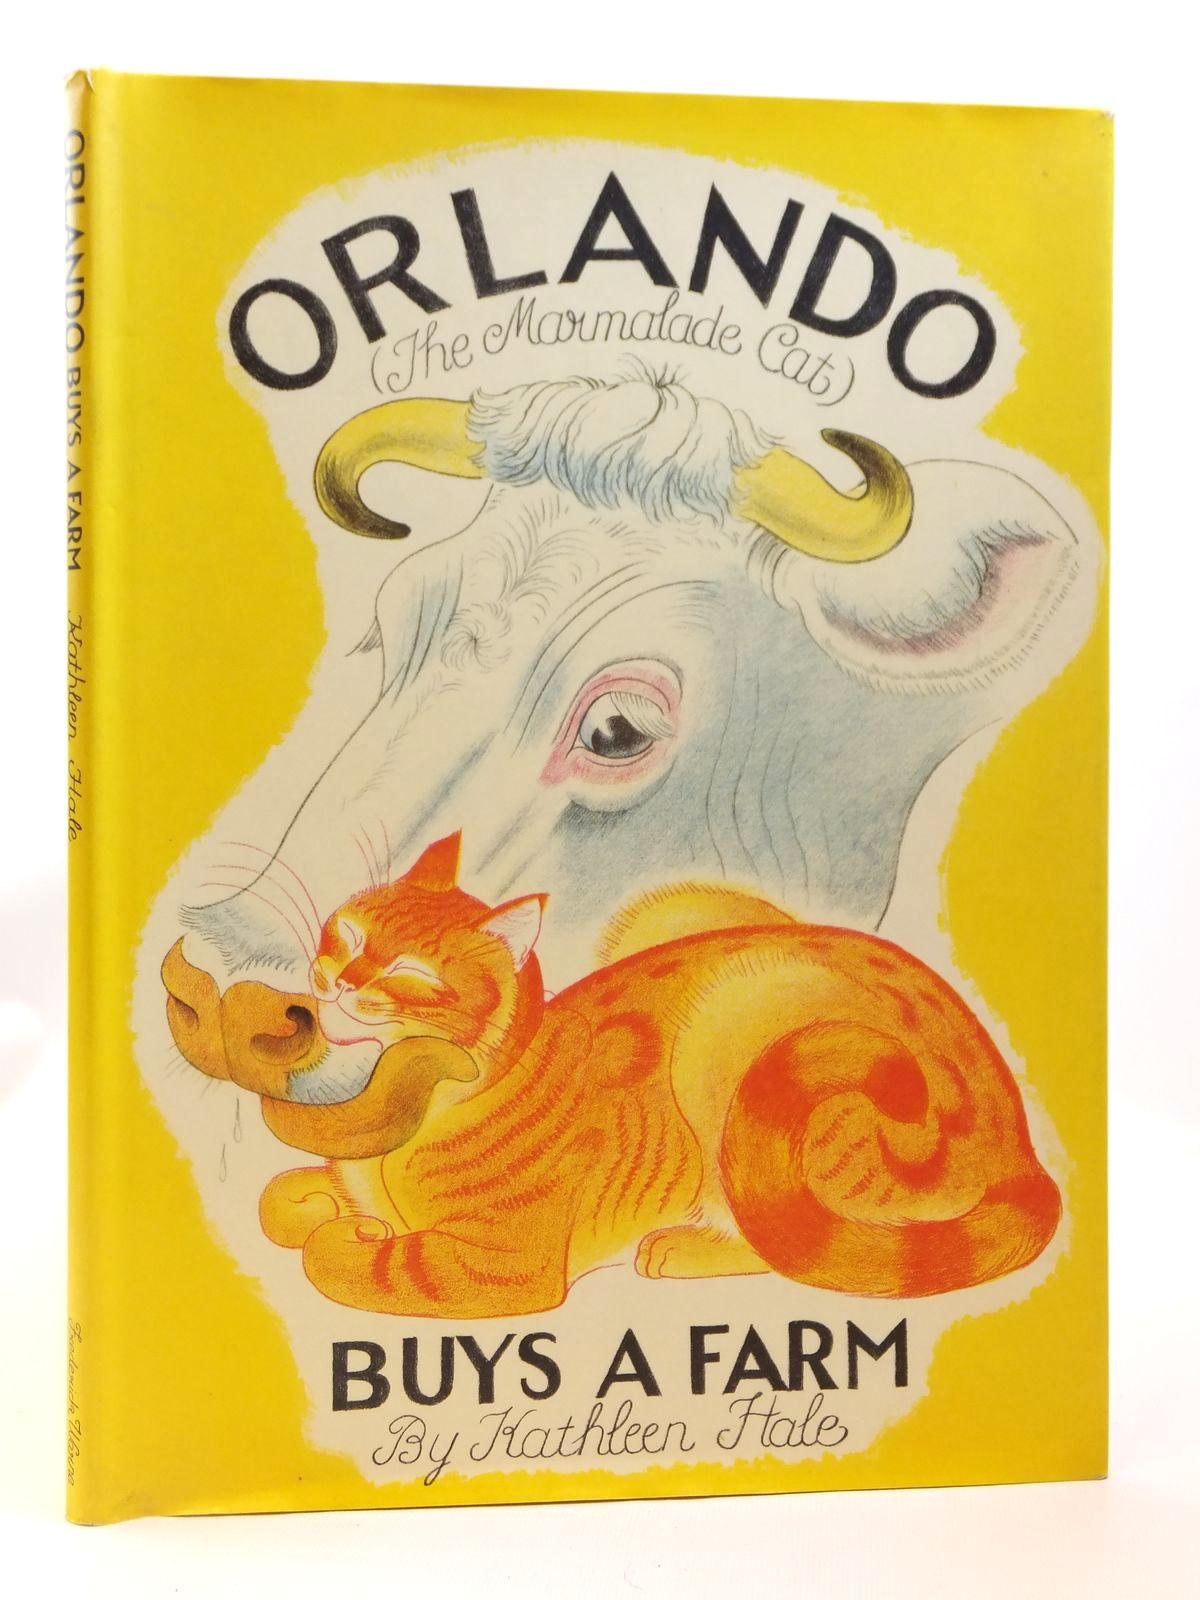 Photo of ORLANDO (THE MARMALADE CAT) BUYS A FARM